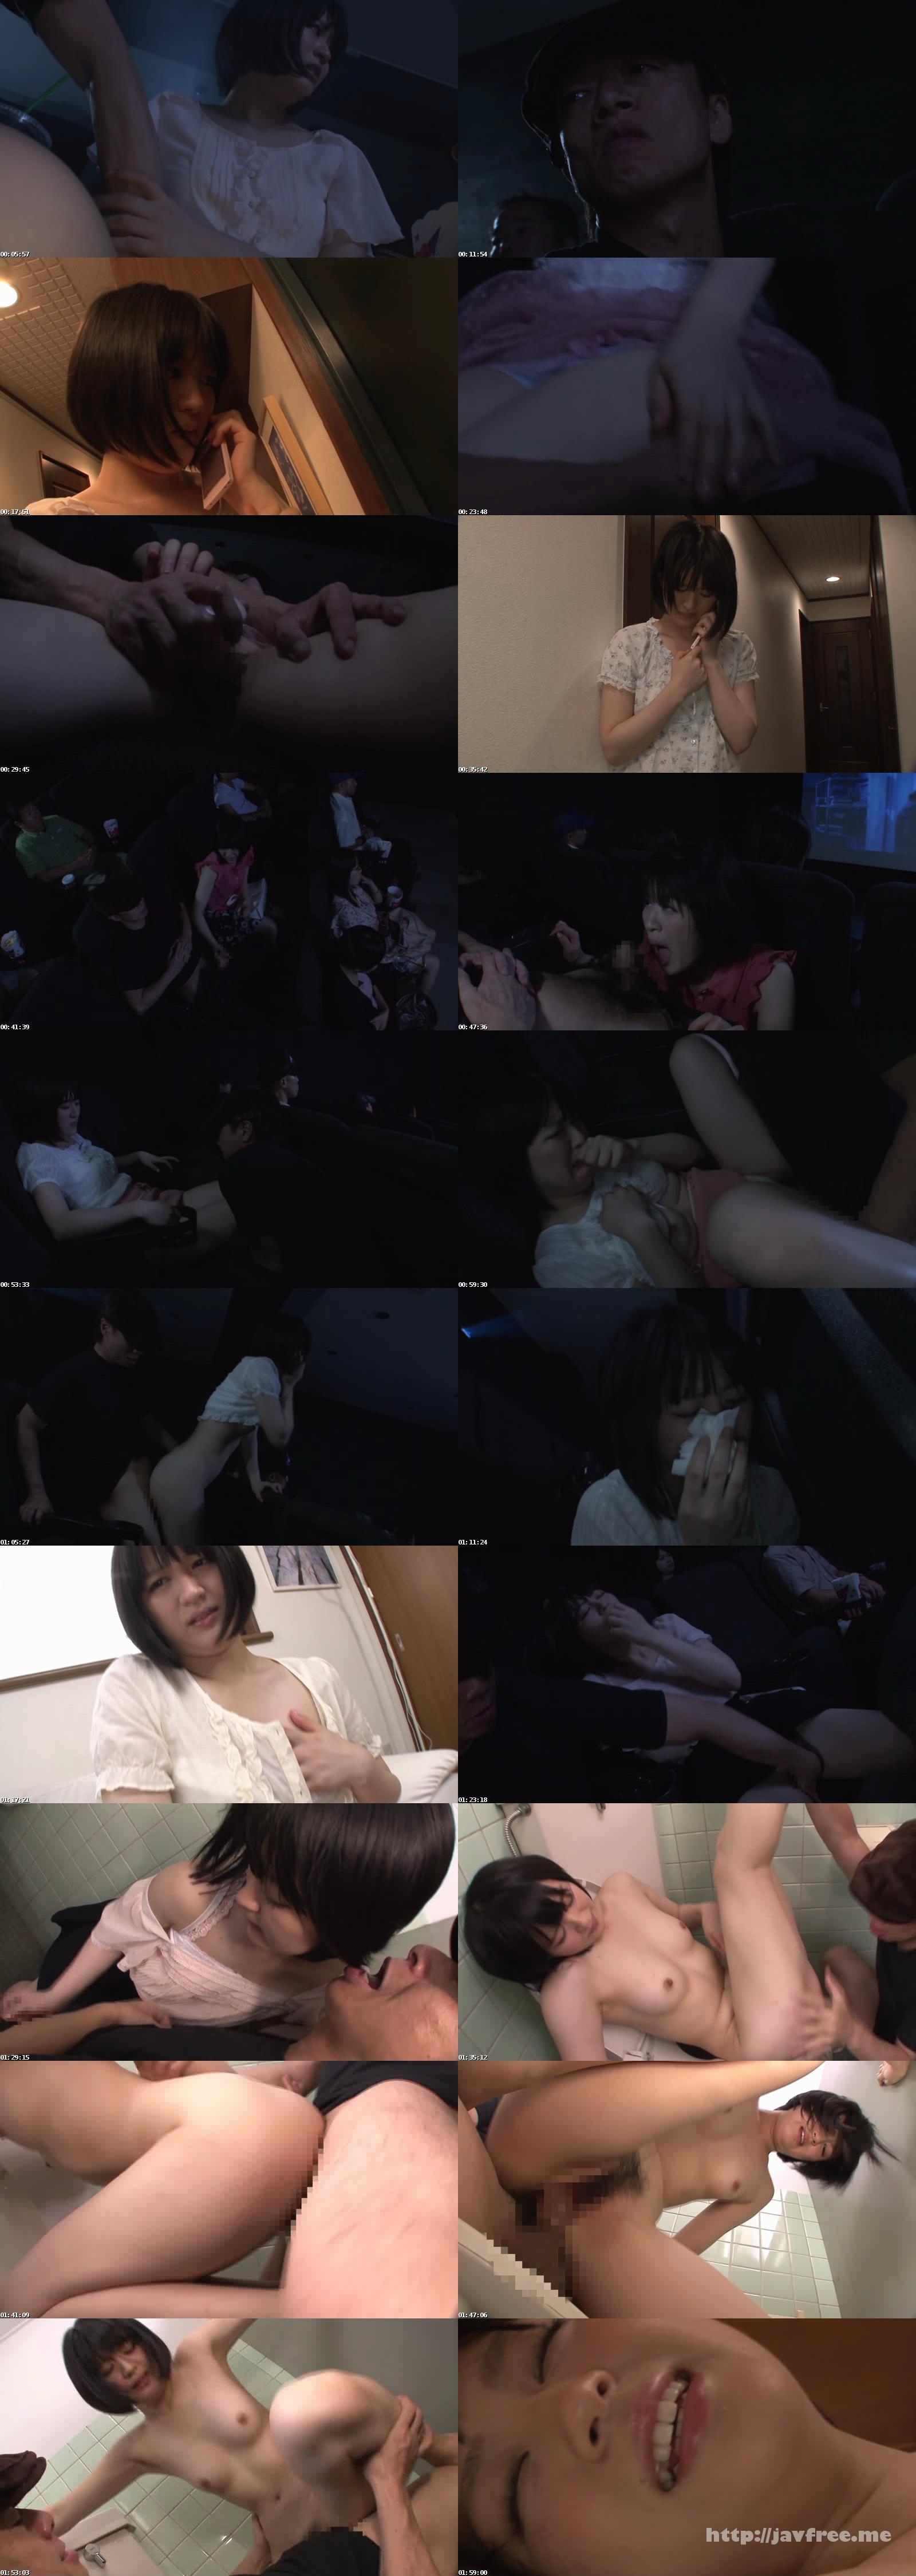 [DV 1680] 映画館痴漢 長澤えりな 長澤えりな DV